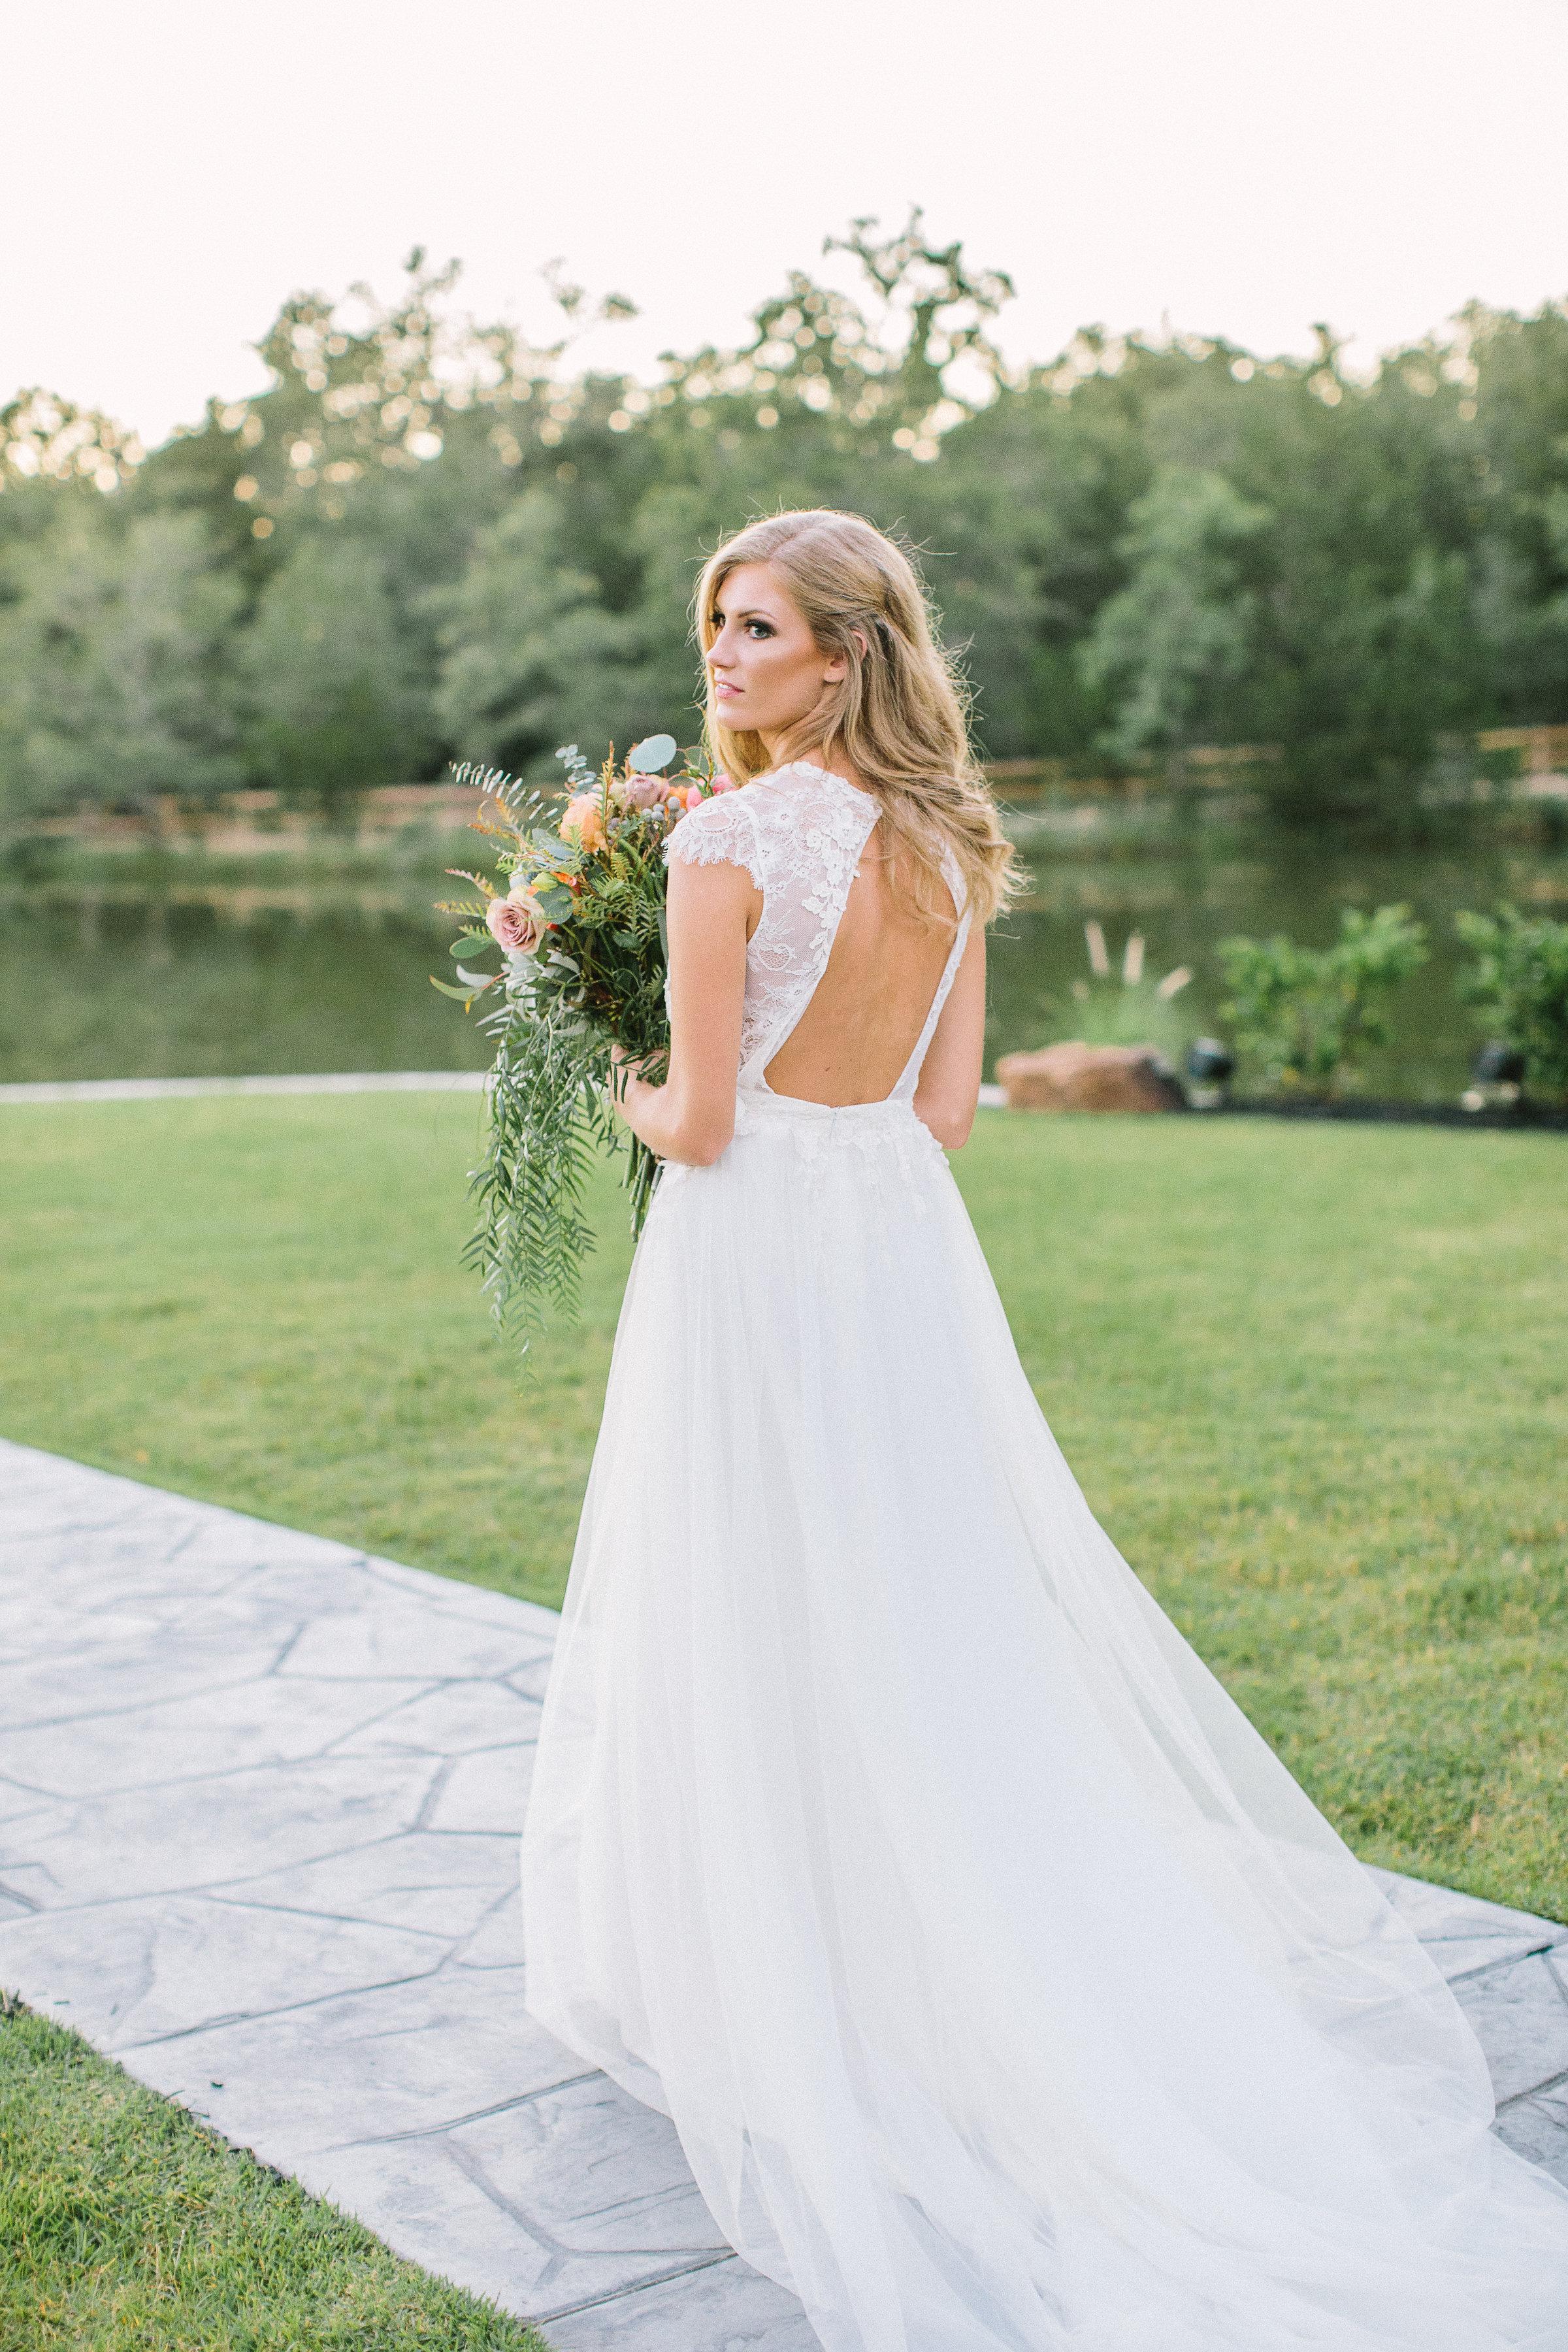 Ellen-Ashton-Photography-Peach-Creek-Ranch-Weddings-Wed-and-Prosper387